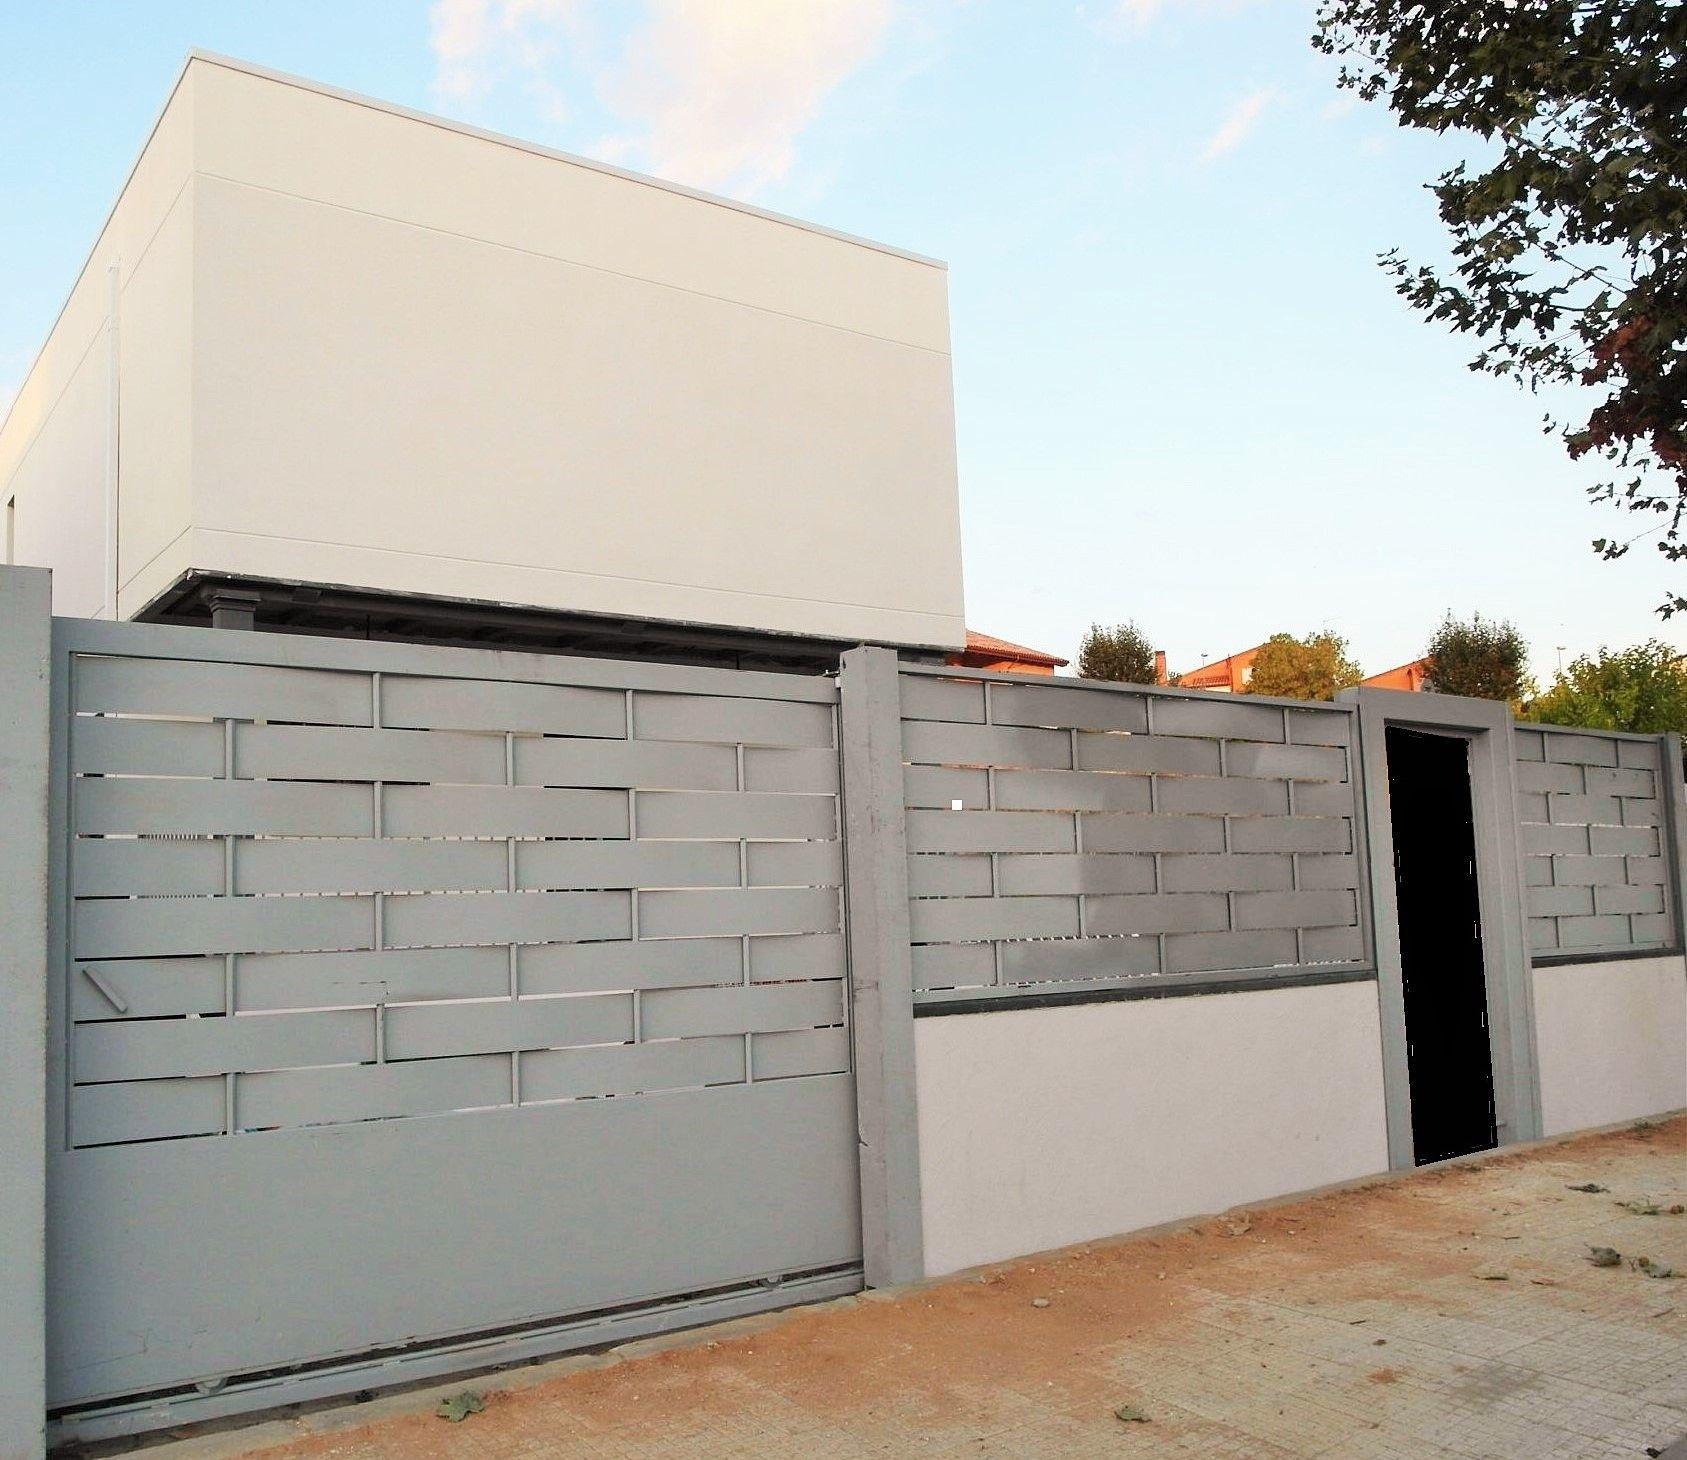 Cerramiento exterior casa prefabricada cubica cerramientos pinterest cubicar casa - Cerramientos de casas ...